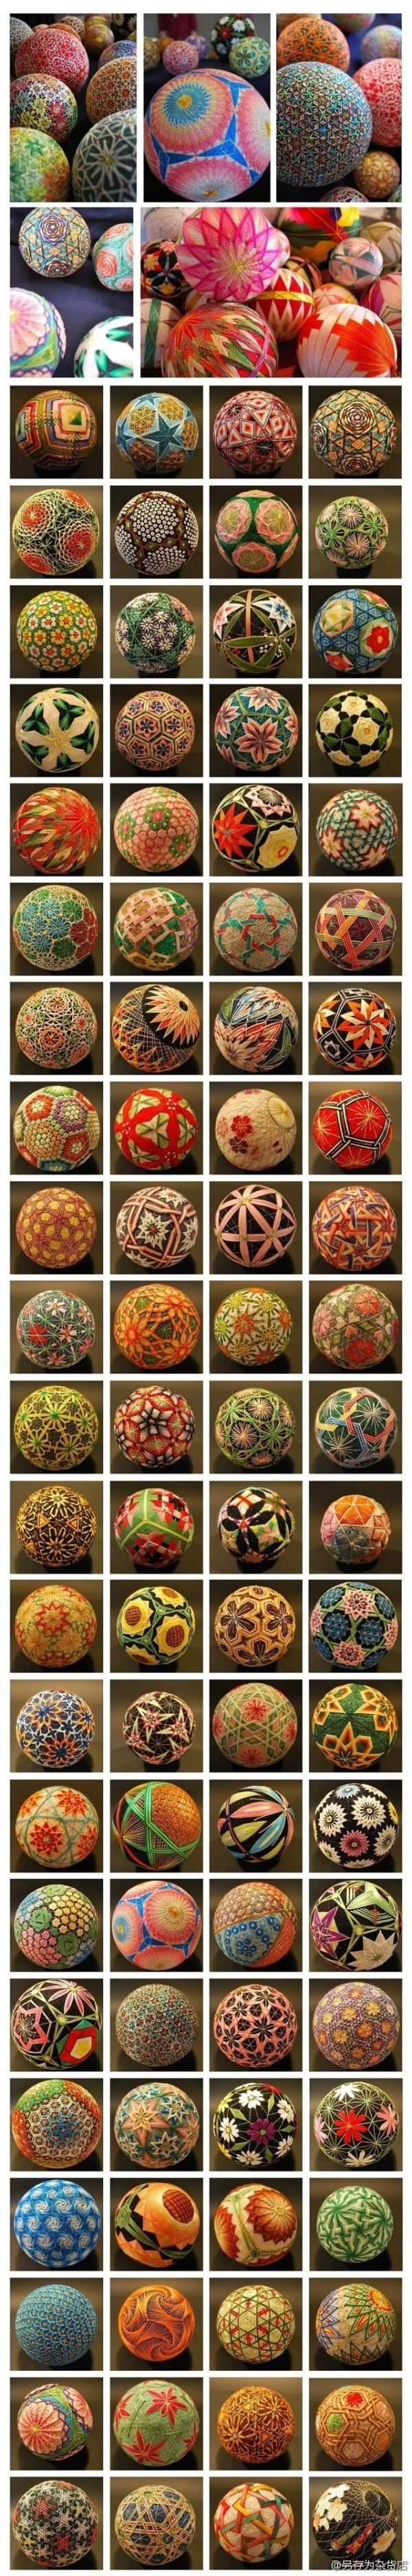 http://www.temari.com/ Japanese thread balls